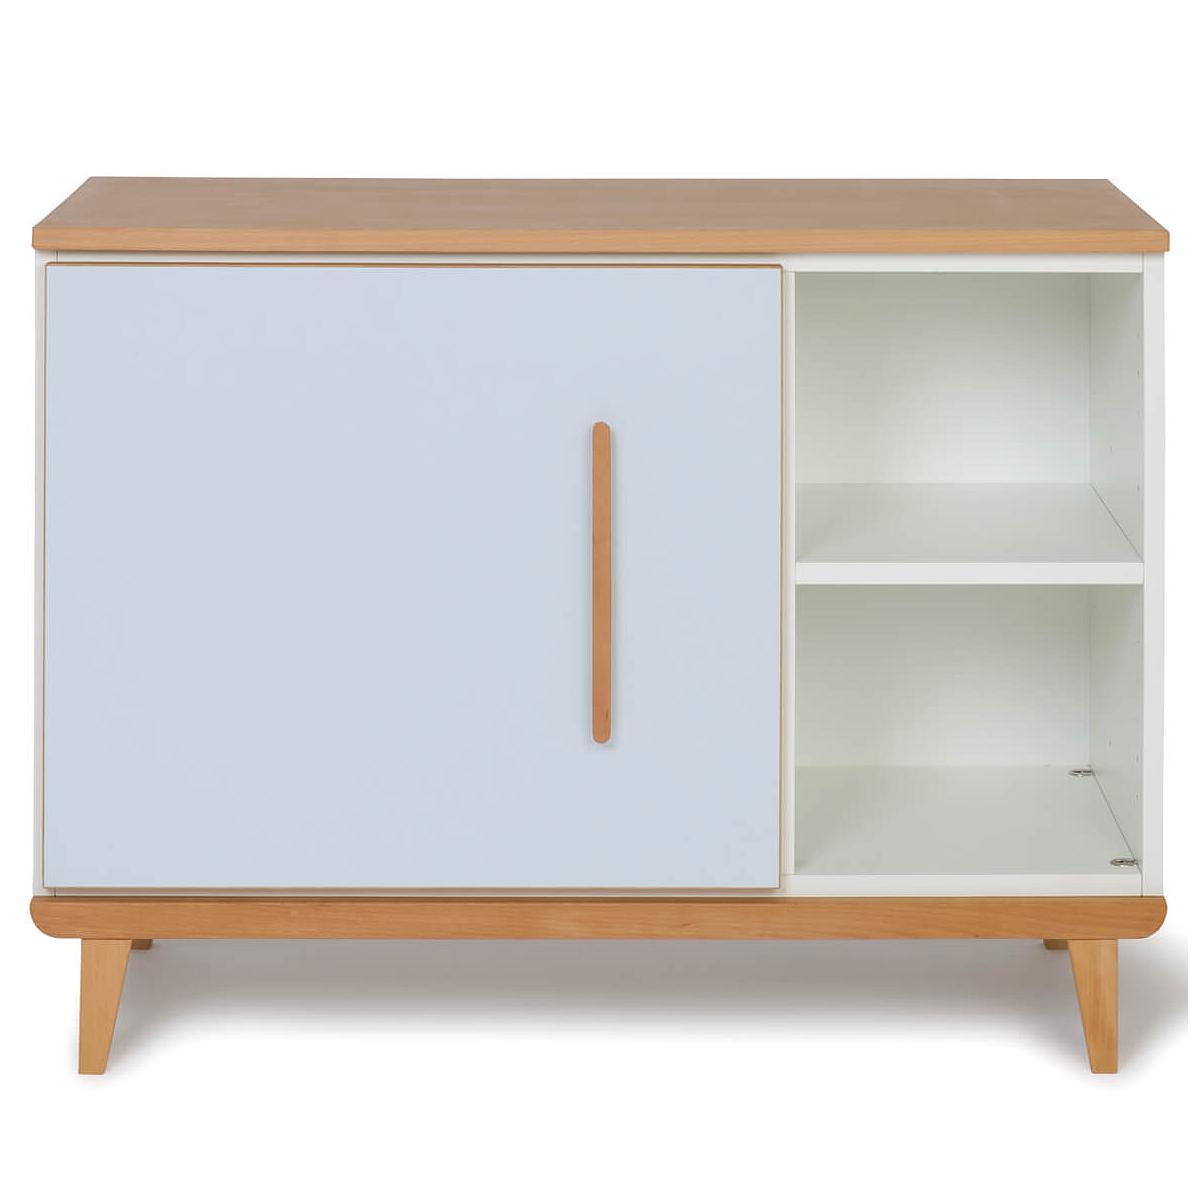 Wookids - Petit meuble 1 porte NADO sky blue